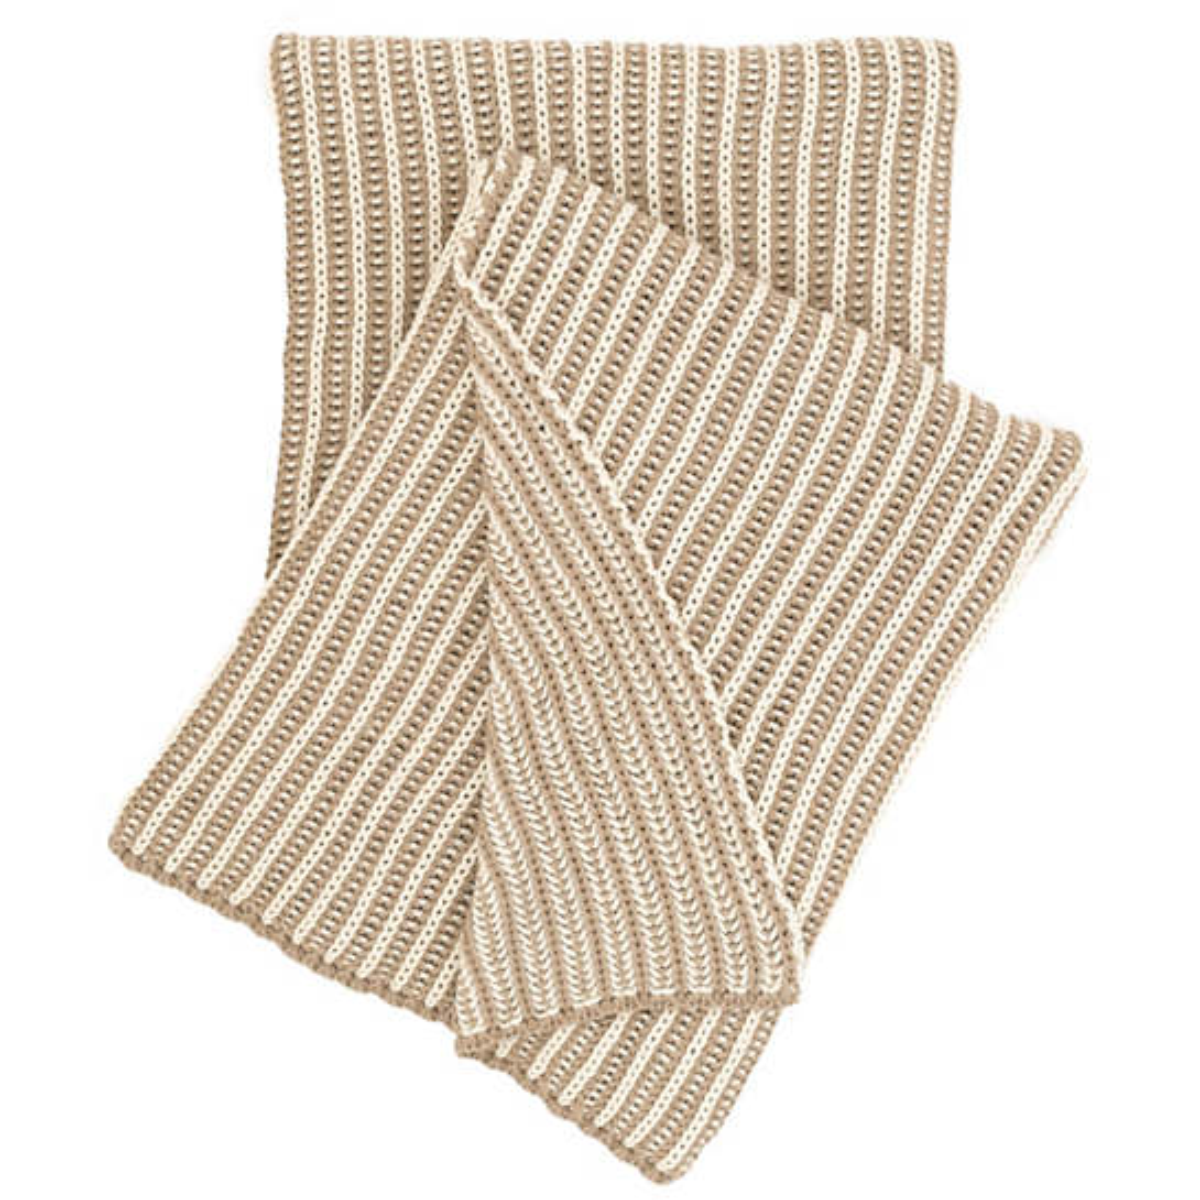 Cozy Knit Linen Throw